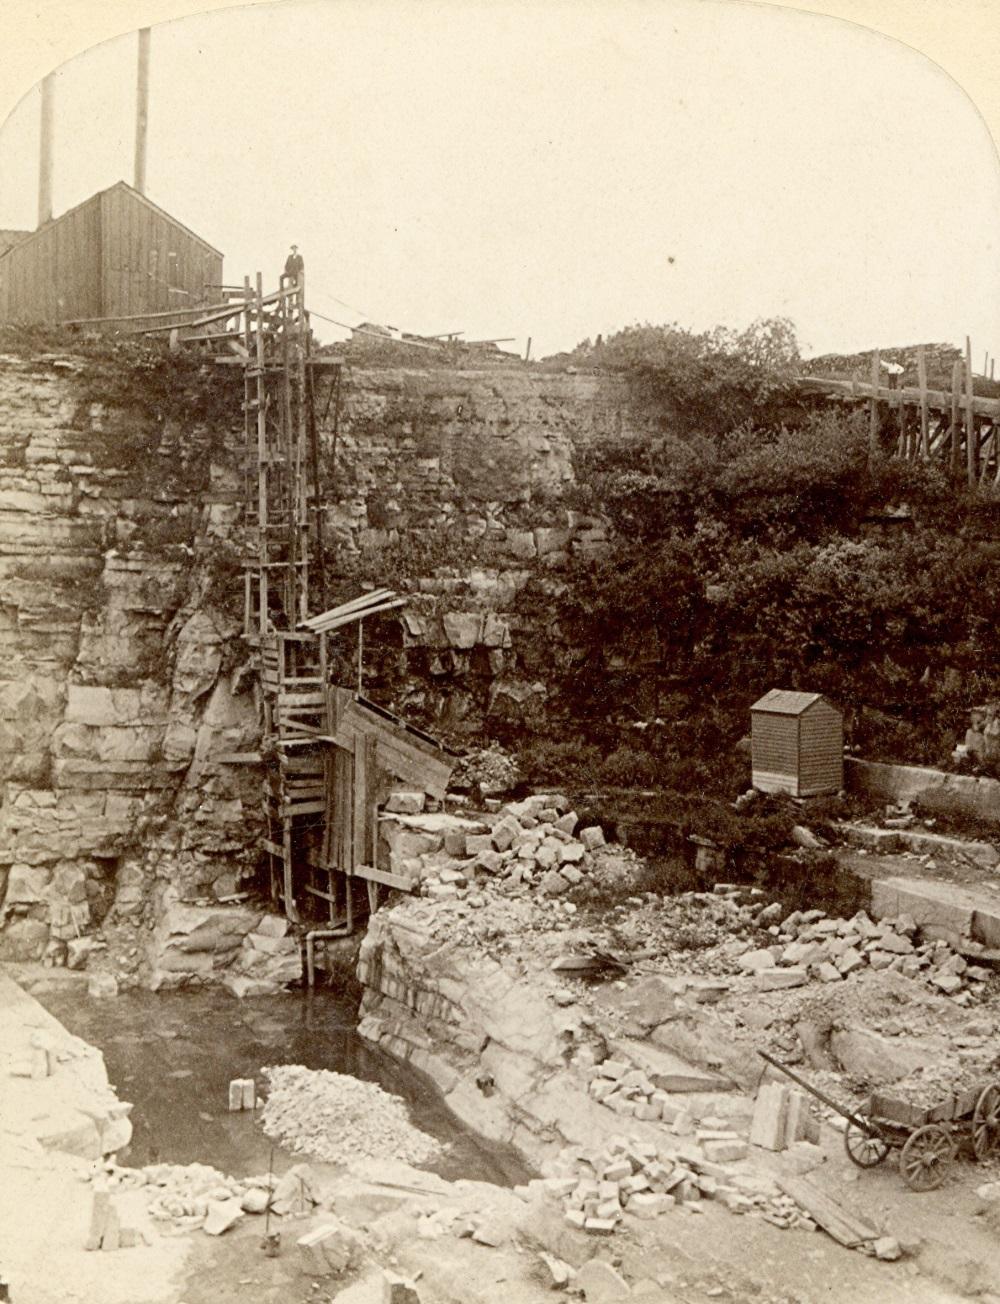 Menomonee Valley, c. early 1880s.